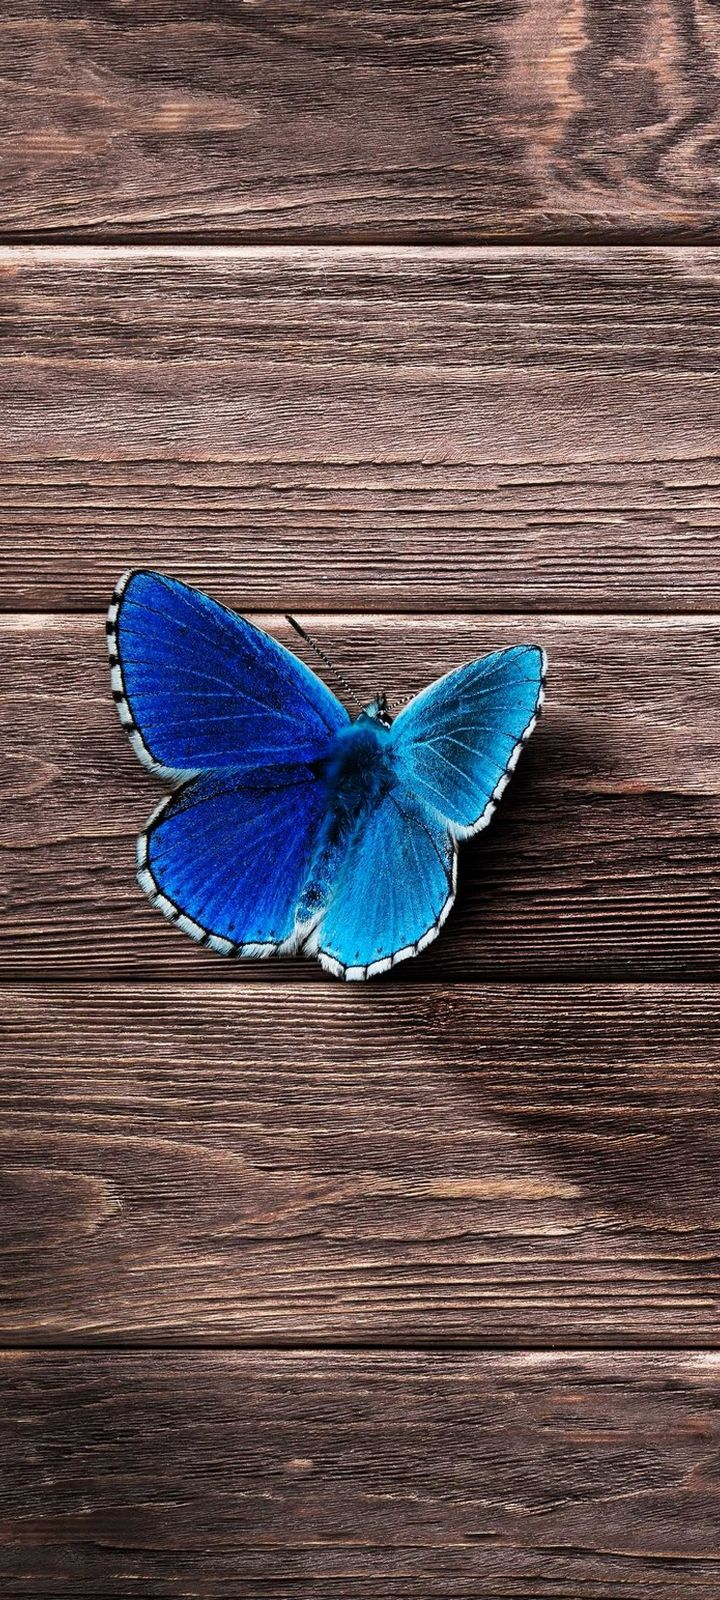 Butterfly Surface Wooden Wallpaper 720x1600